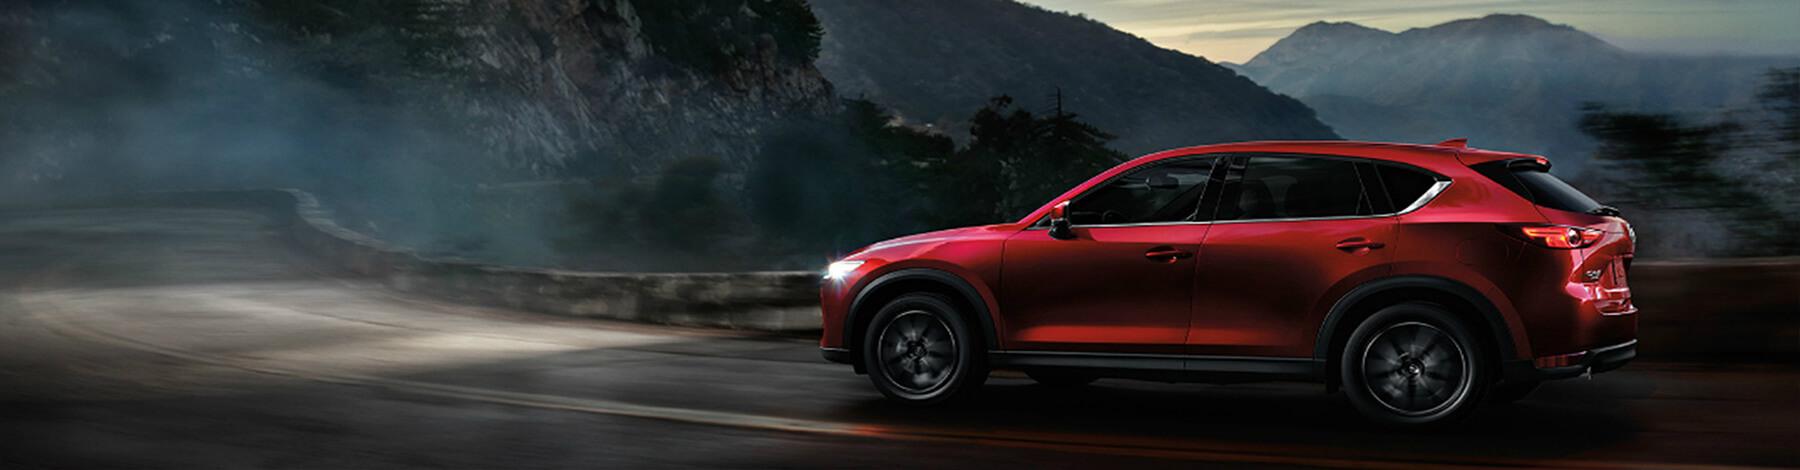 Berwick Mazda - Recent Deliveries